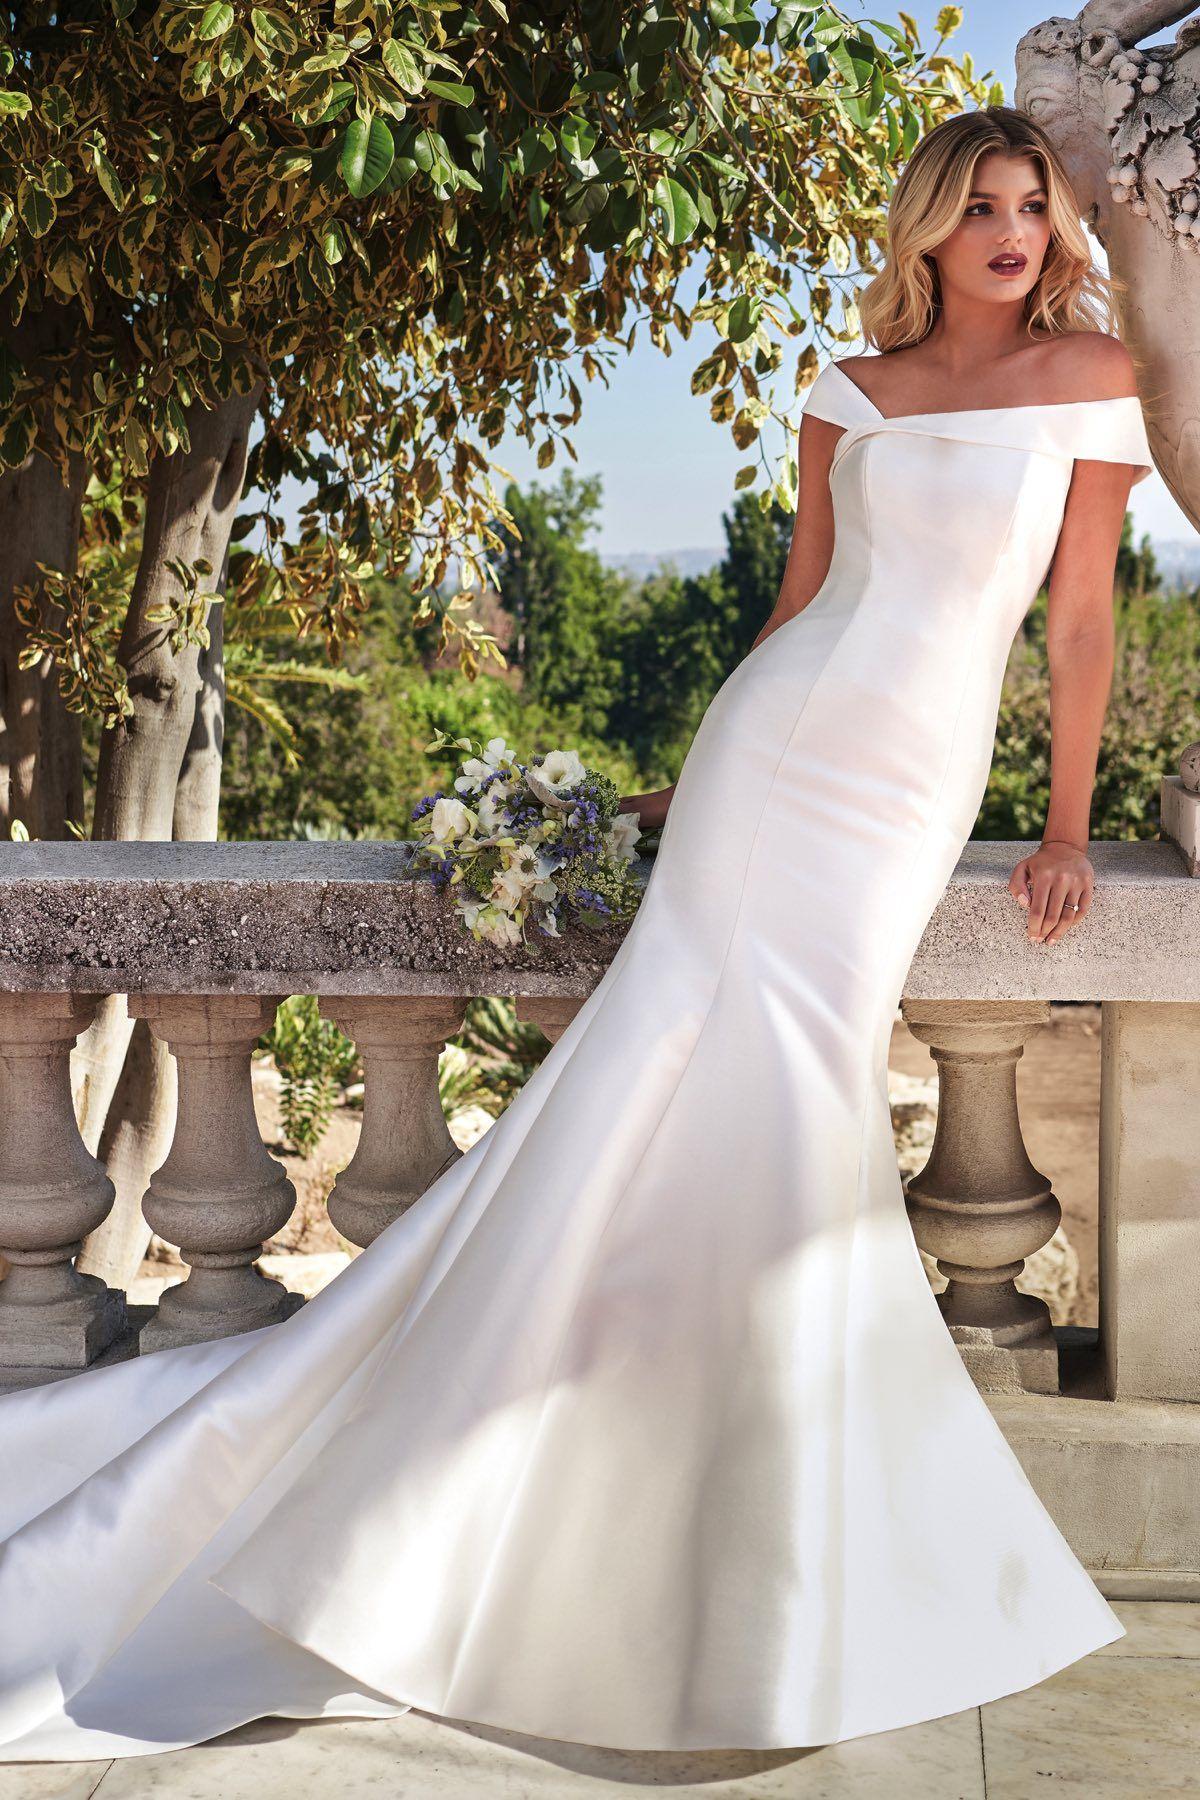 F221002 Mikado Asymmetrical Neckline Wedding Dress With Semi Cathedral Train Wedding Dress Necklines Jasmine Bridal Bridal Gowns [ 1800 x 1200 Pixel ]